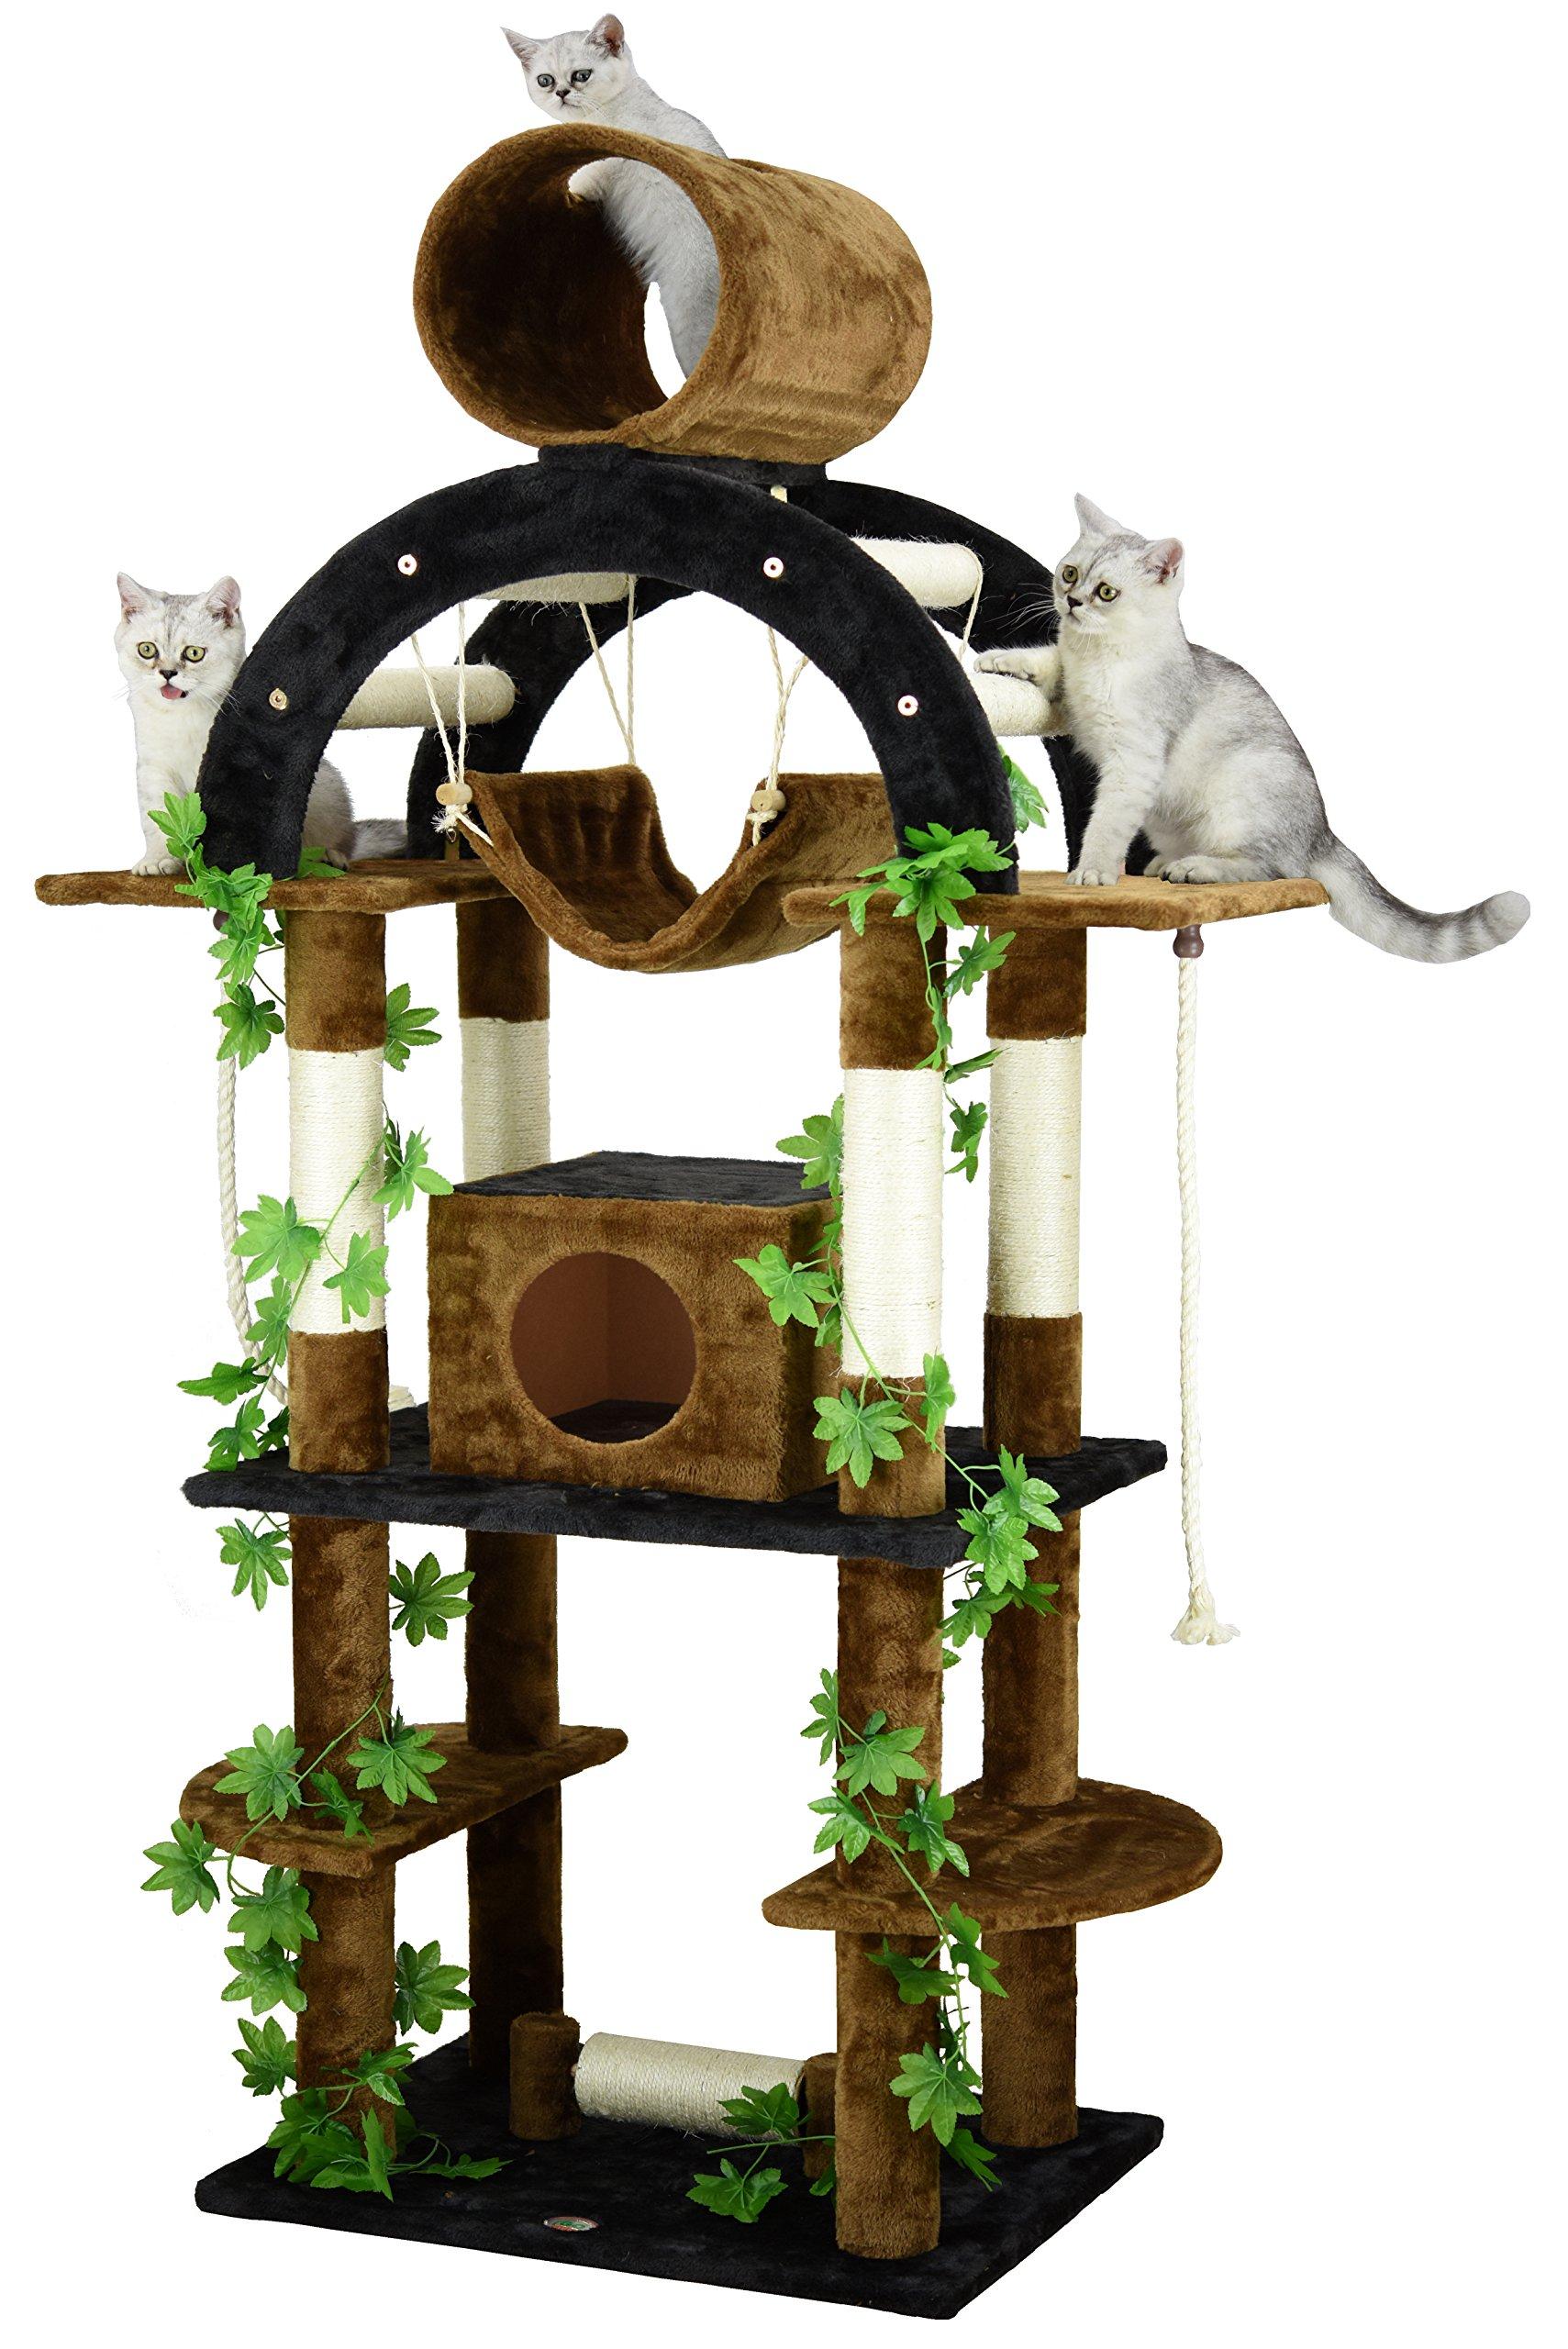 Go Pet Club F2096 Luxury Climber Cat Tree, 71''